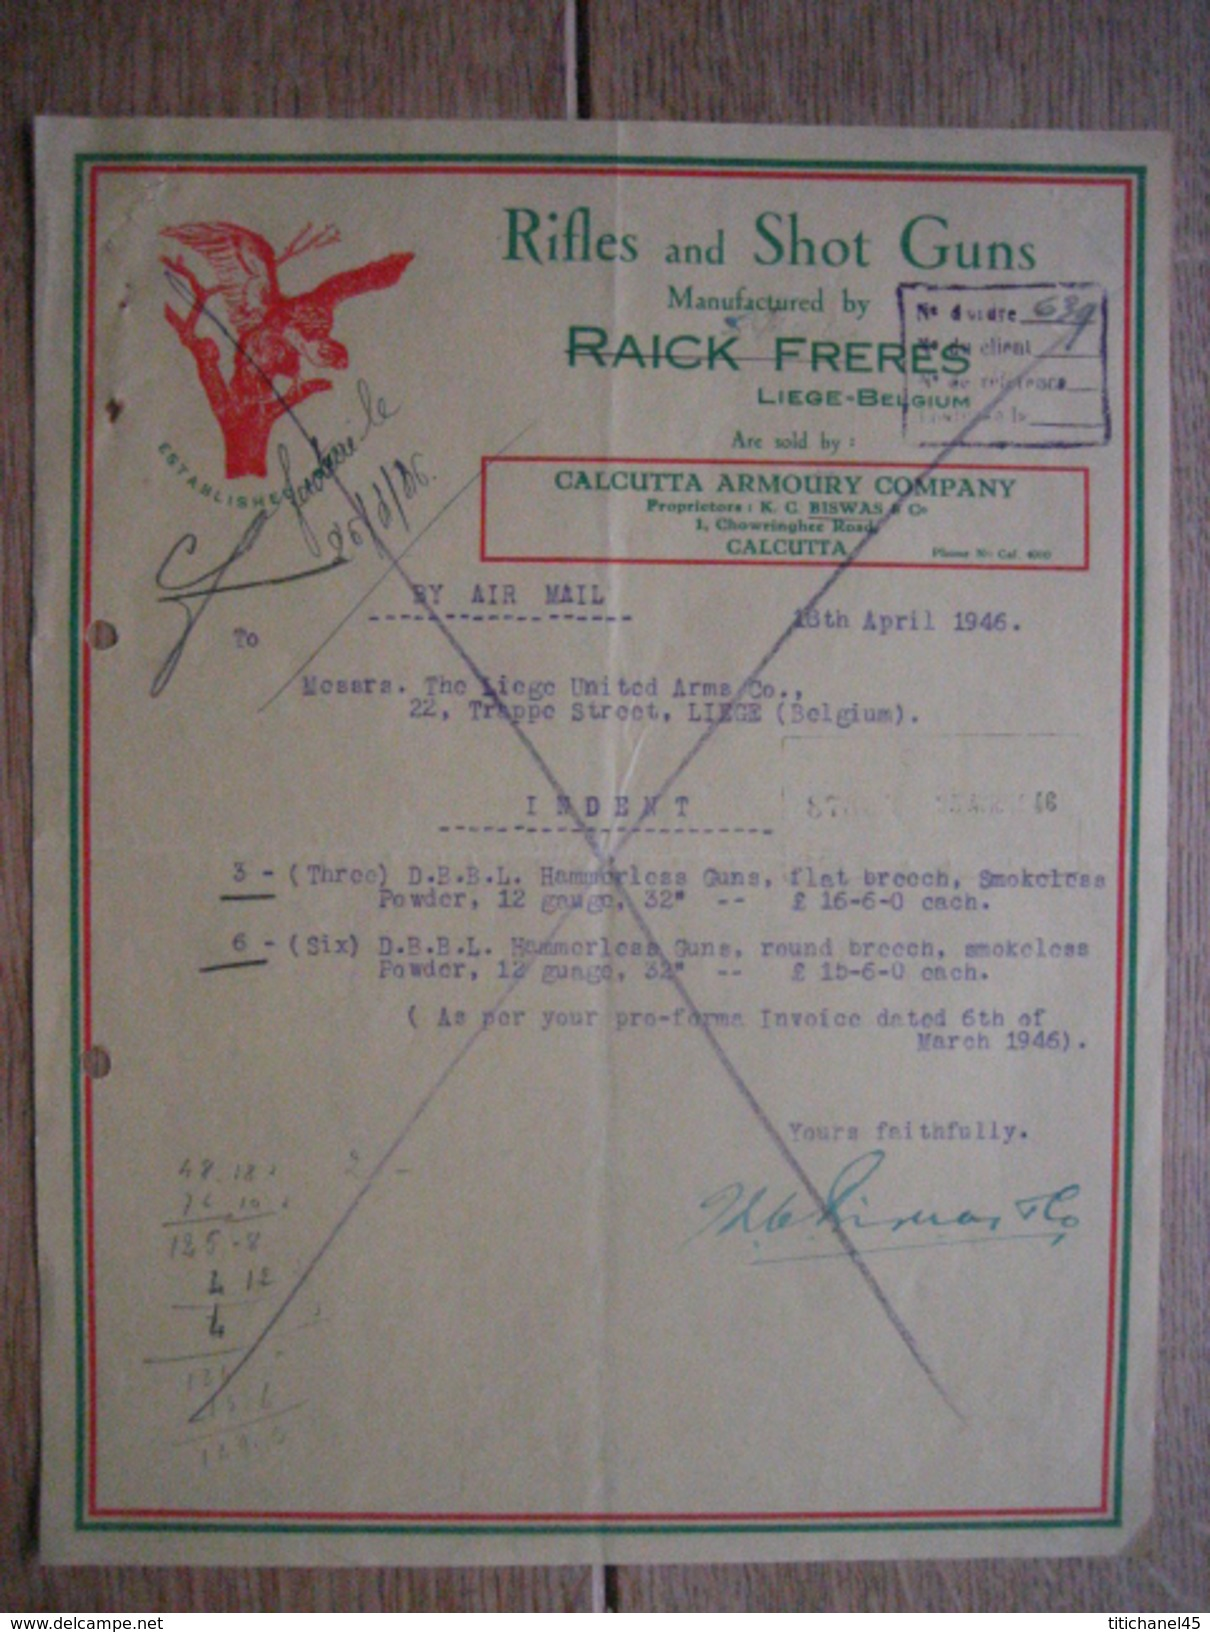 Lettre 1946 CALCUTTA - CALCUTTA ARMOURY COMPANY - Rifles And Shot Guns Manufactured By RAICK FRERES, LIEGE - Factures & Documents Commerciaux